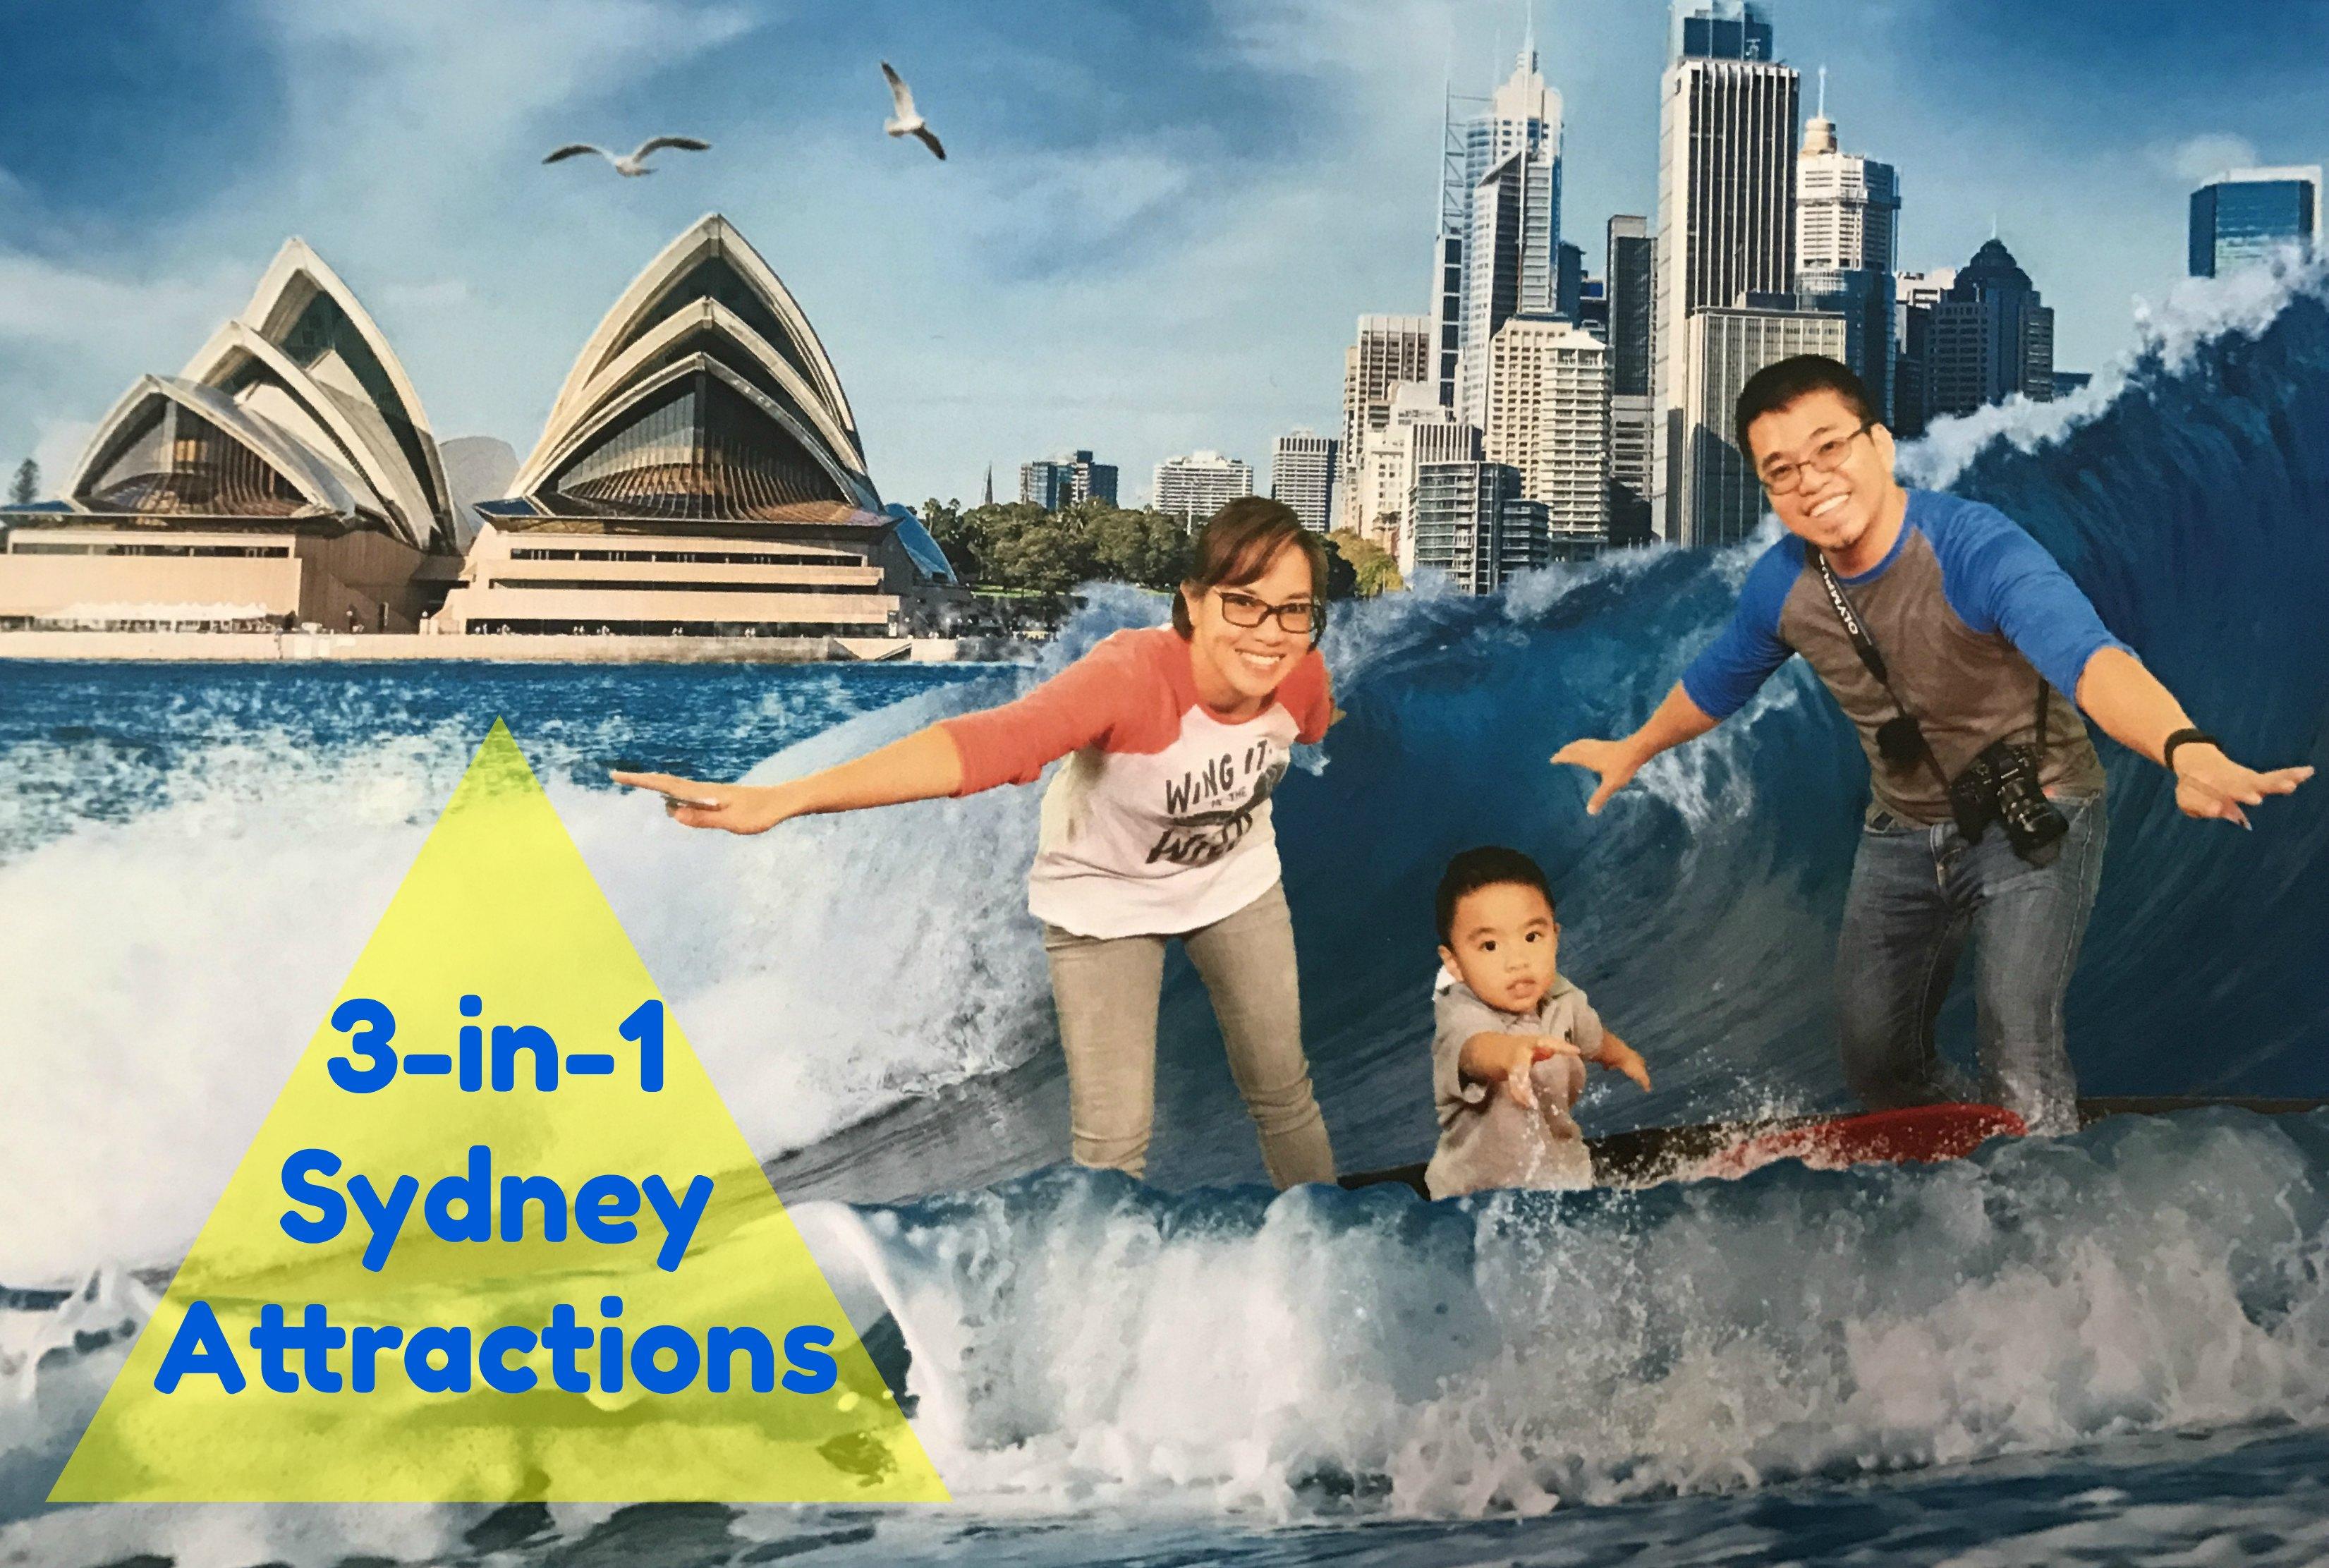 3-in-1 Sydney Australia Attractions NSW, 2016